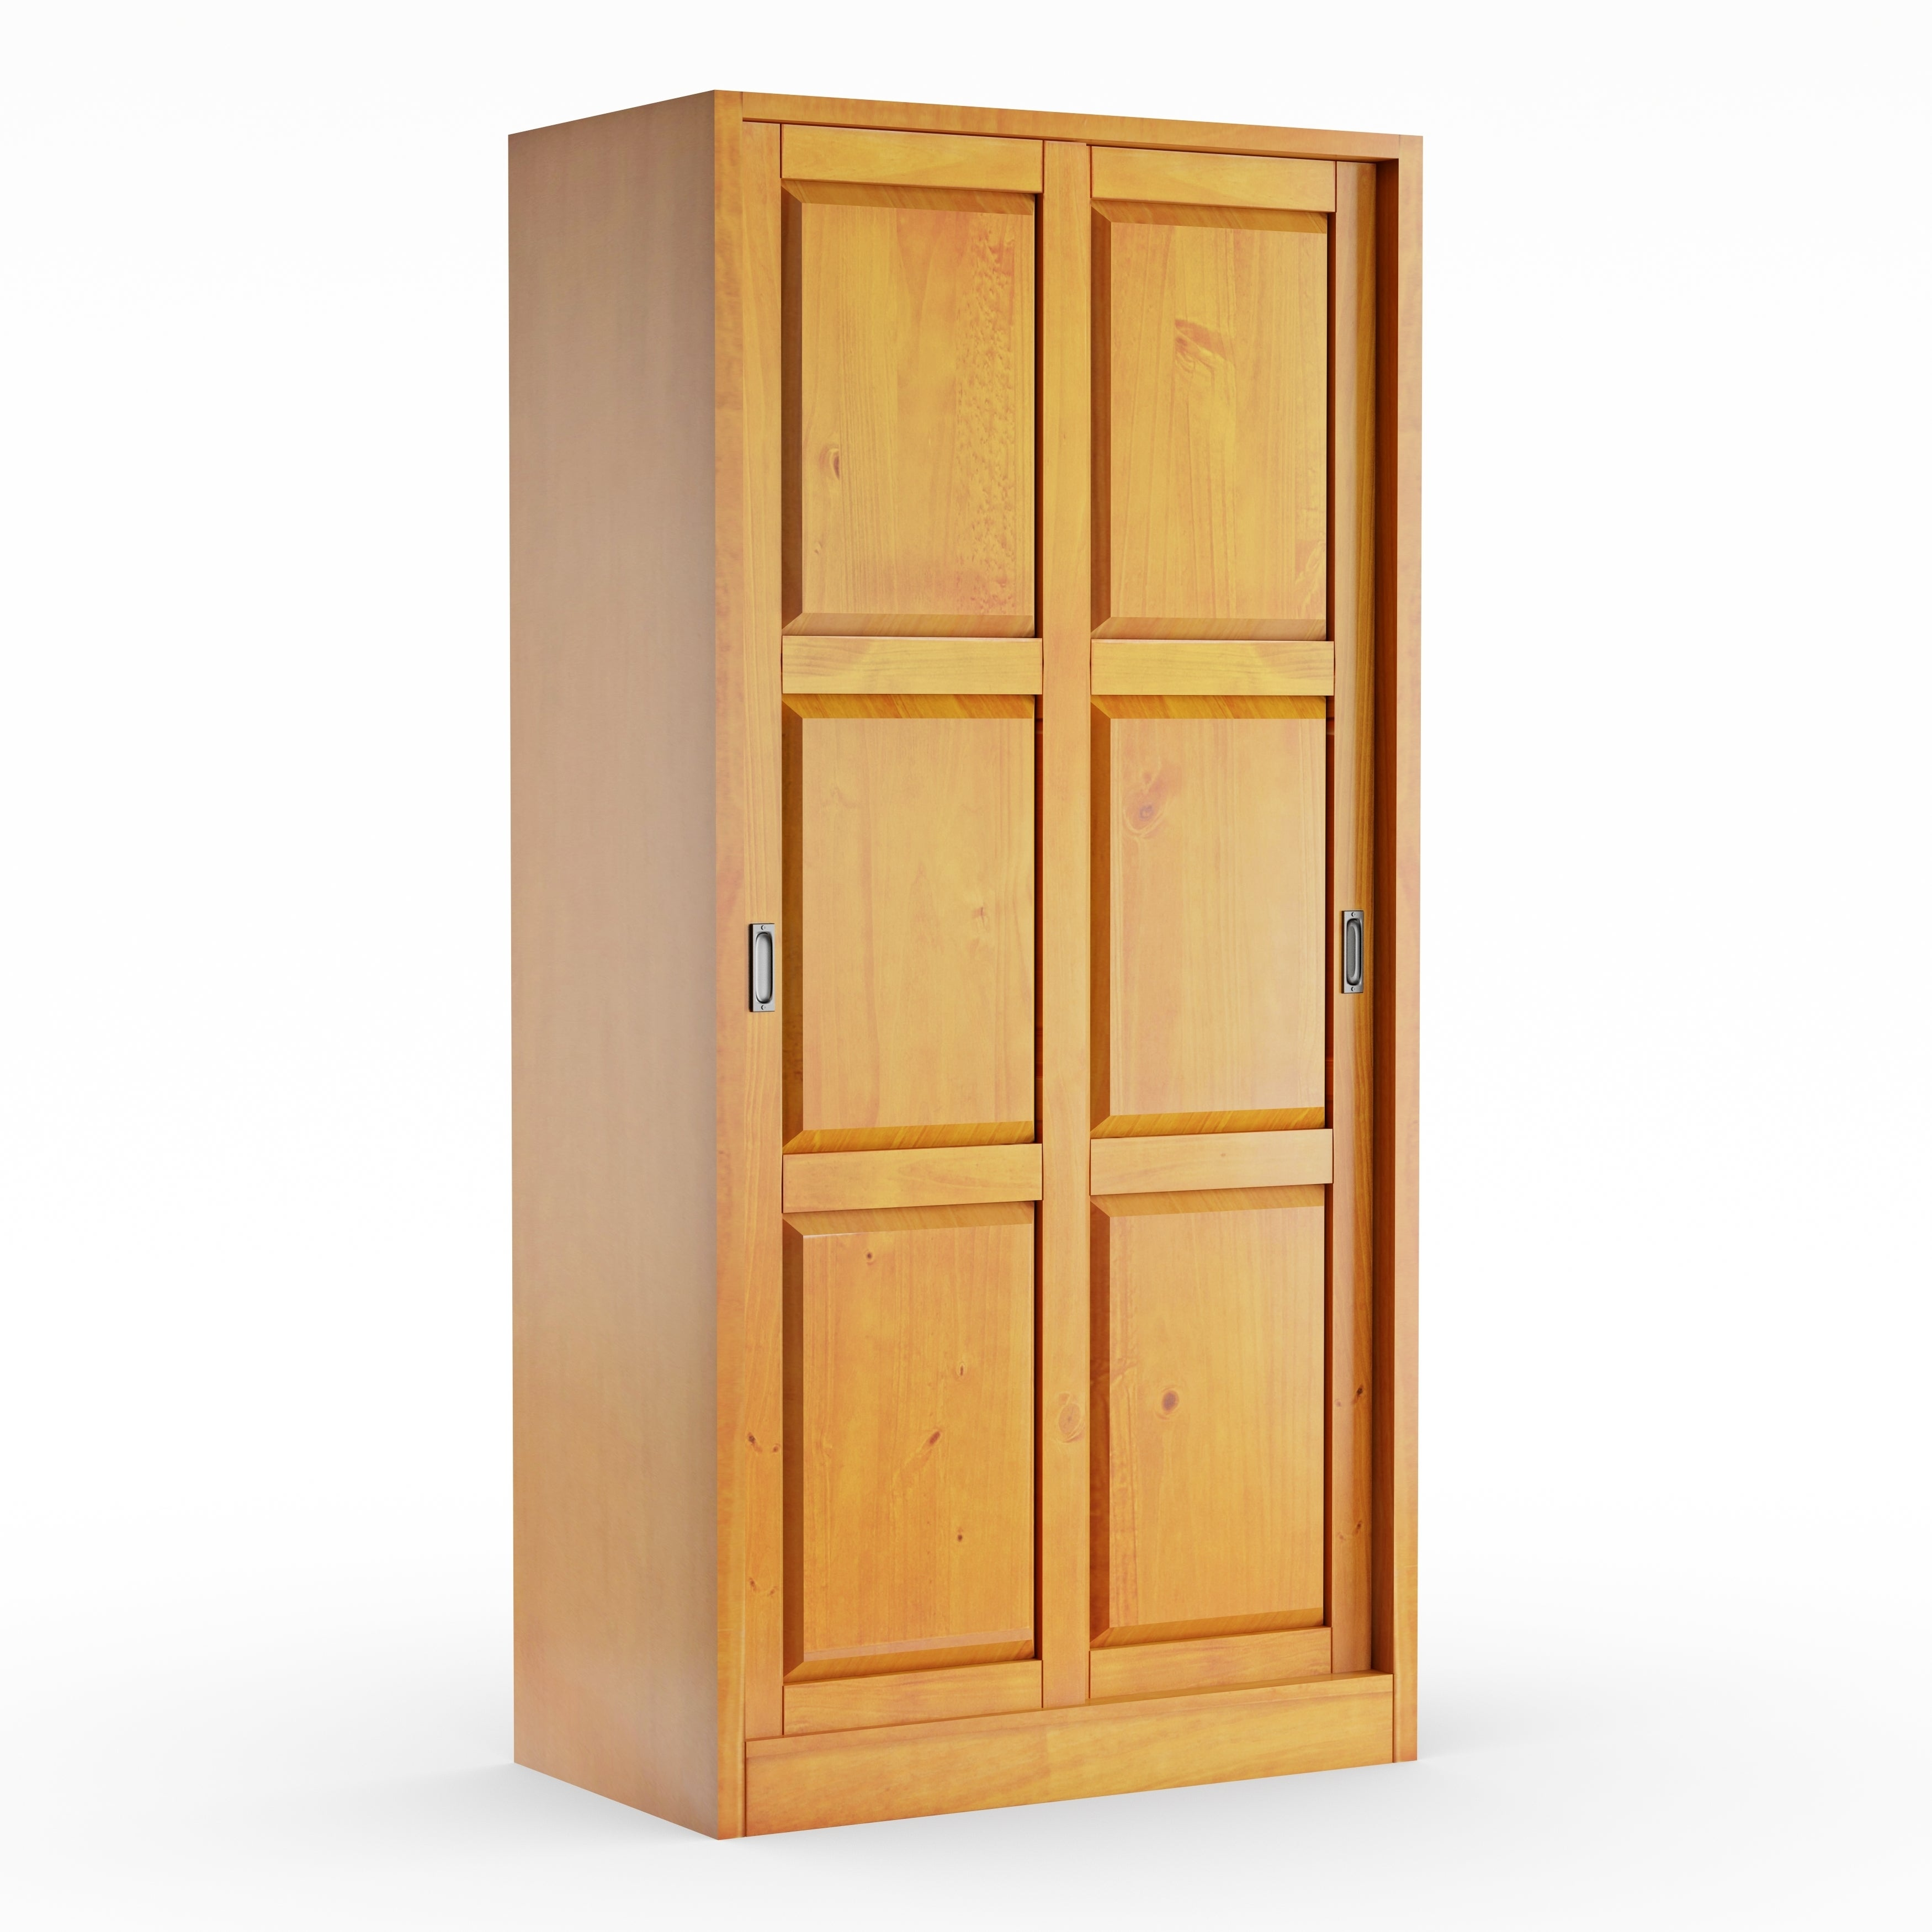 latest wardrobe solid set furniture bedroom product china design zcbnlvxsmavl wood for